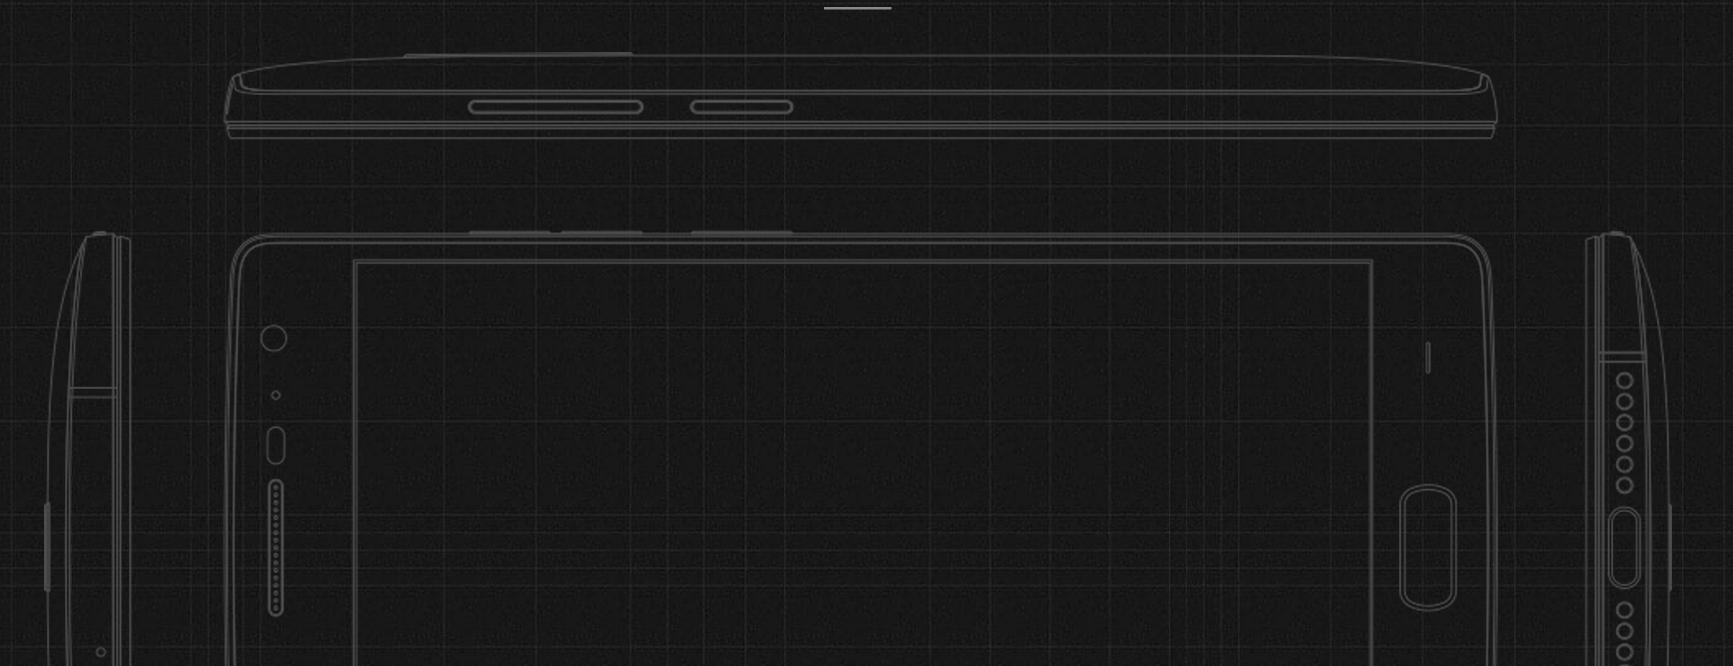 OnePlus 2 NFC